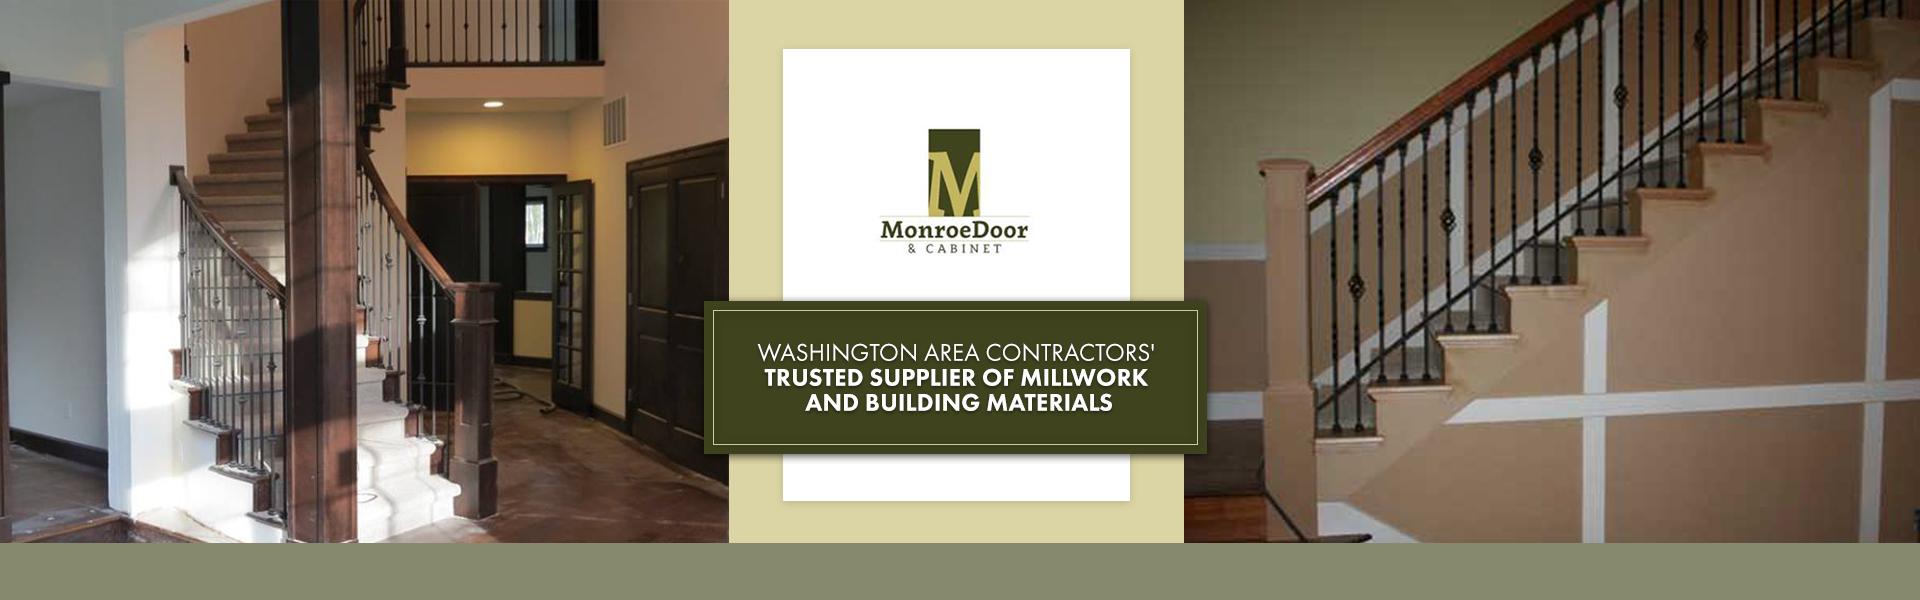 320 & Building Materials Store u0026 Millwork in Monroe WA